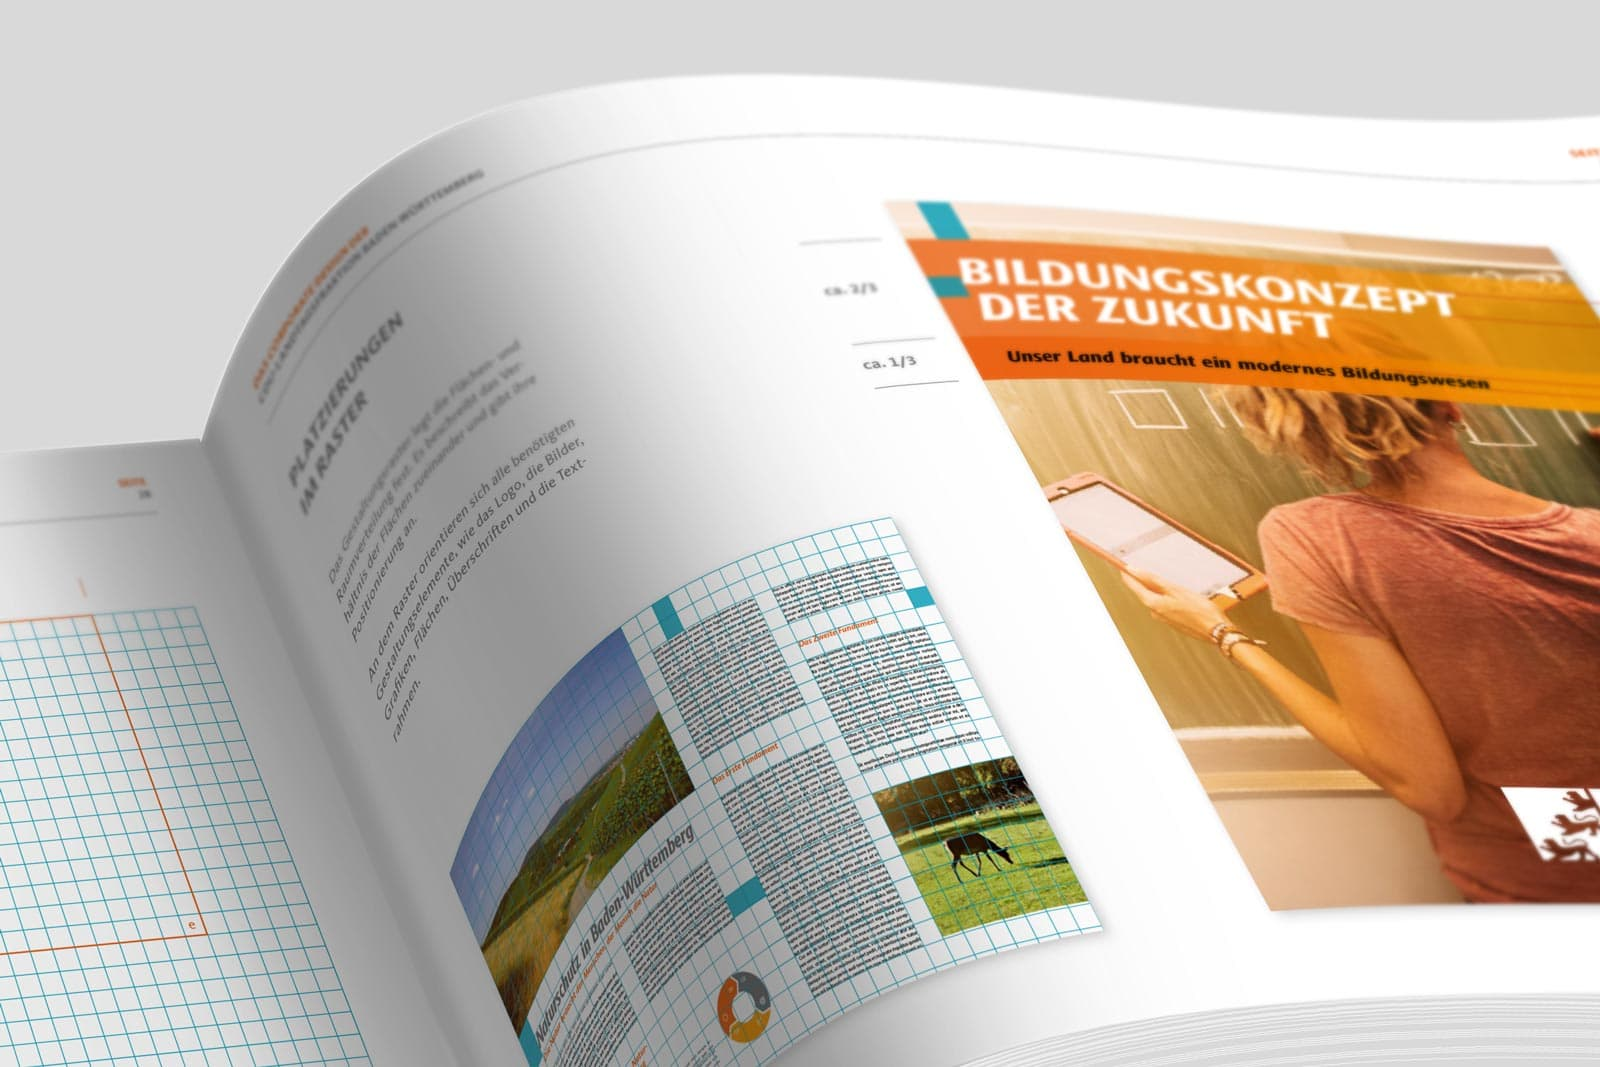 CDU_LF_BW, Styleguide, Corporate Design Relaunch, Redesign, Detail 1